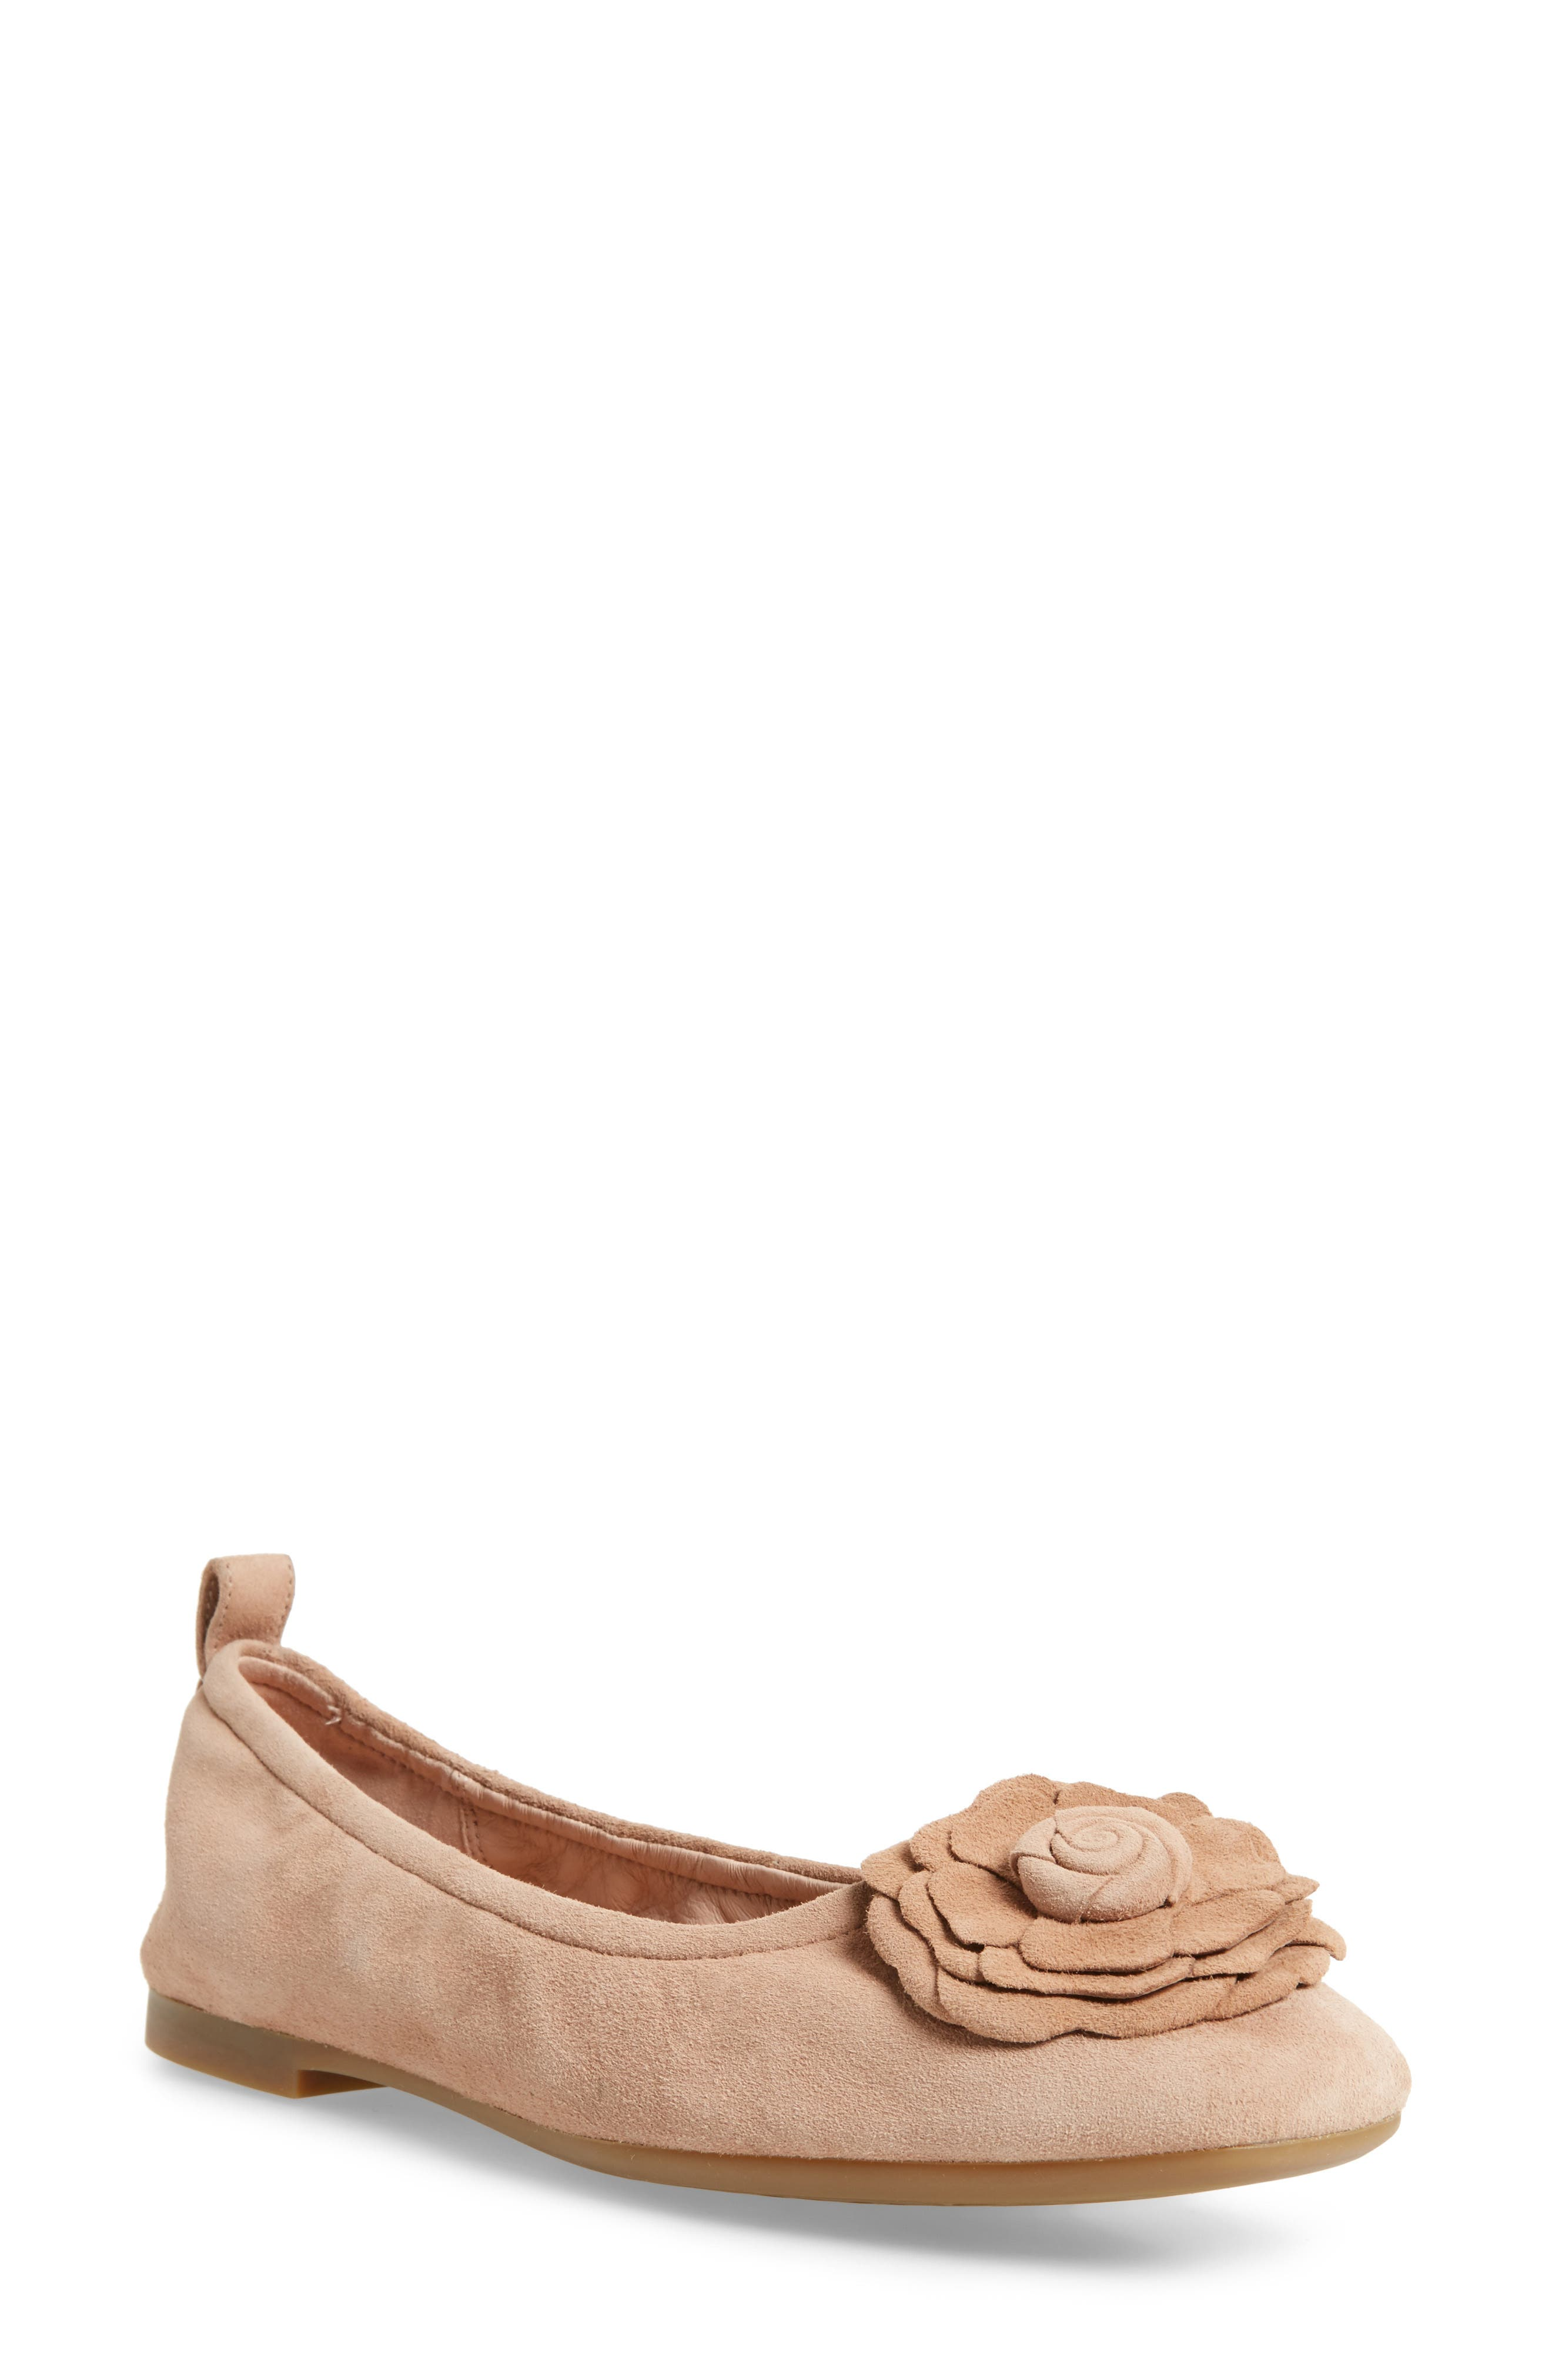 Rosalyn Ballet Flat,                         Main,                         color, Soft Beige Suede